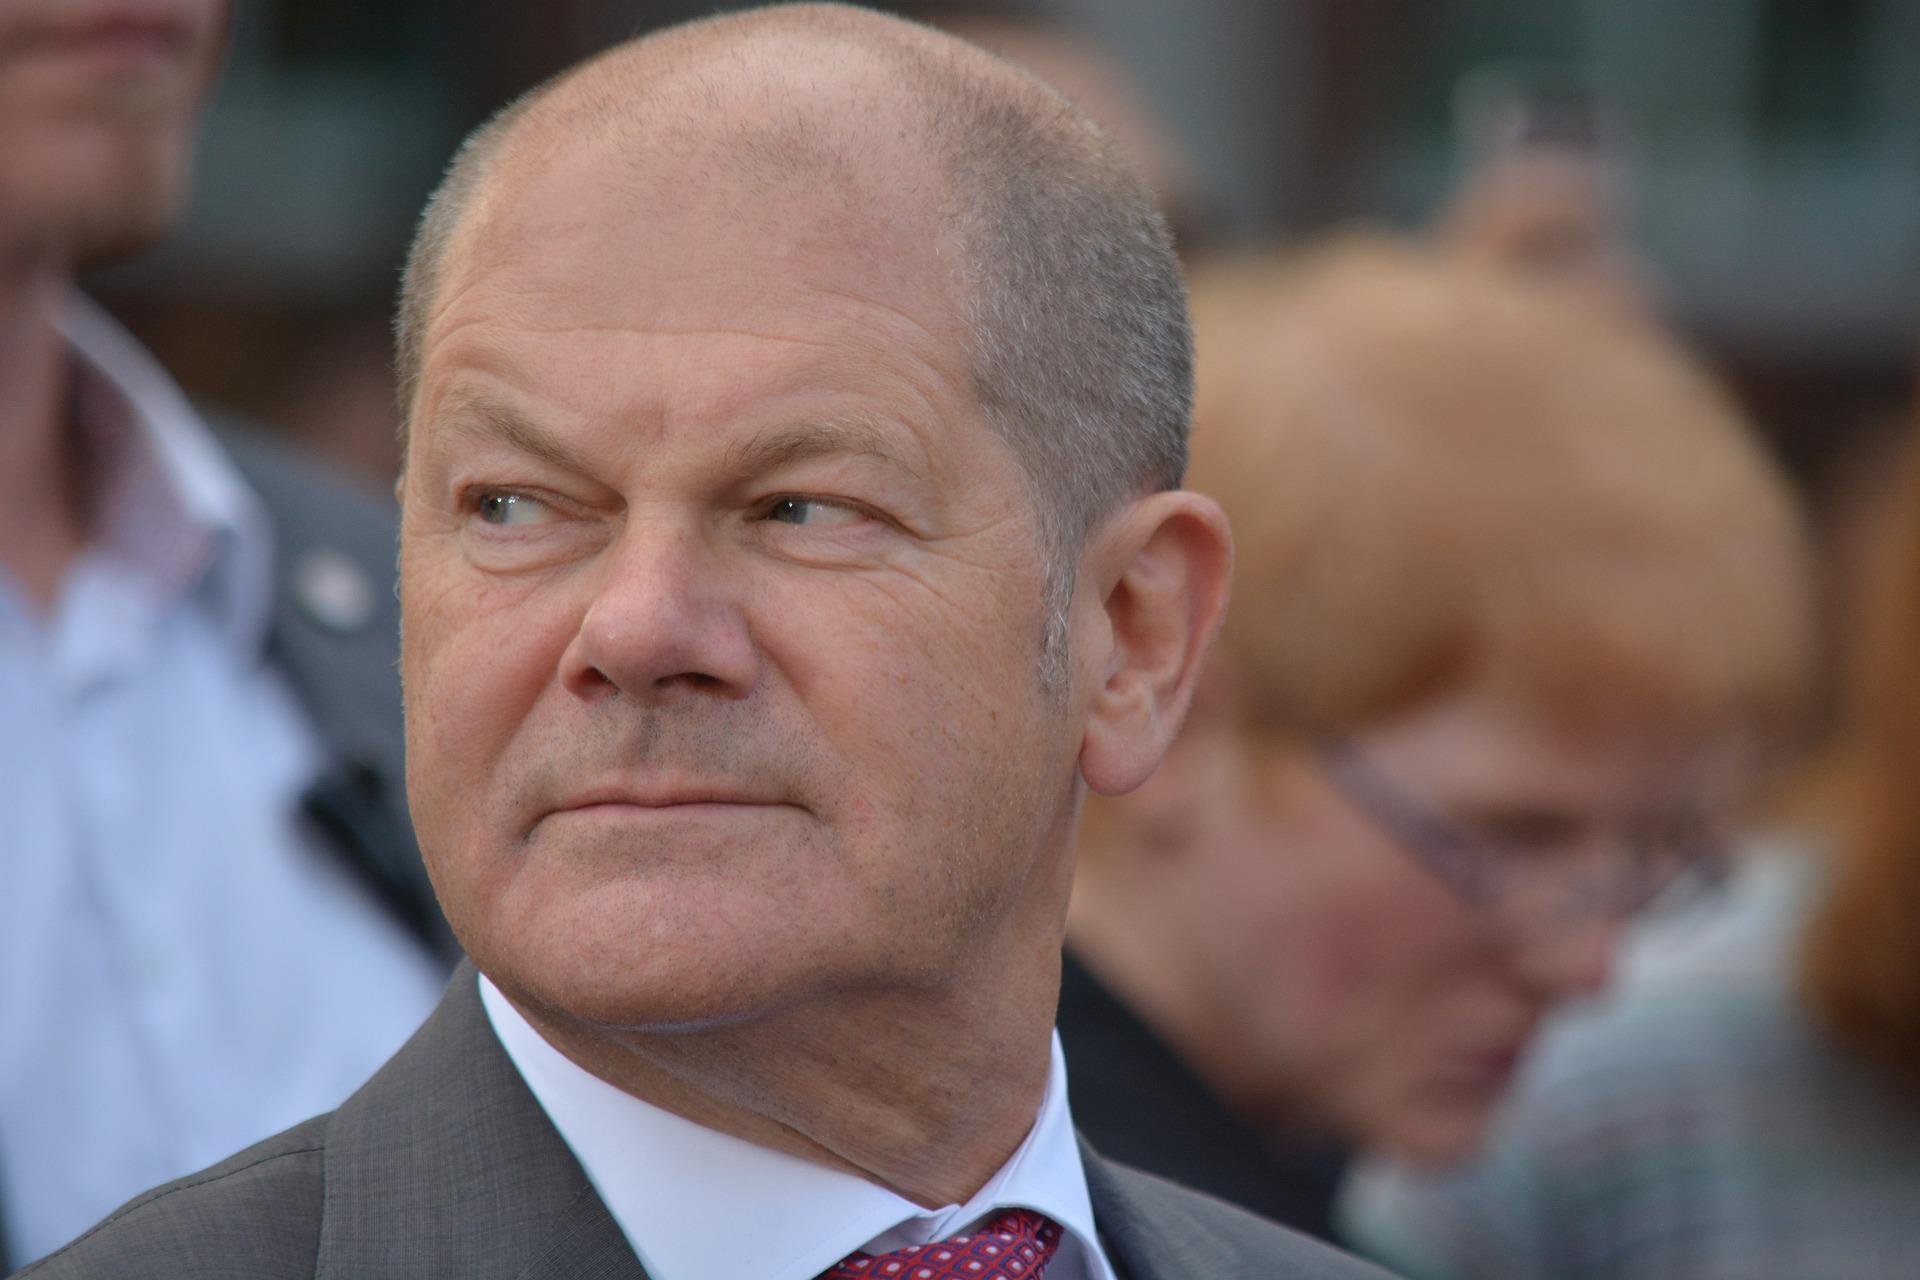 Corona-Krise: Olaf Scholz will EU-Hilfe von 200 Milliarden Euro